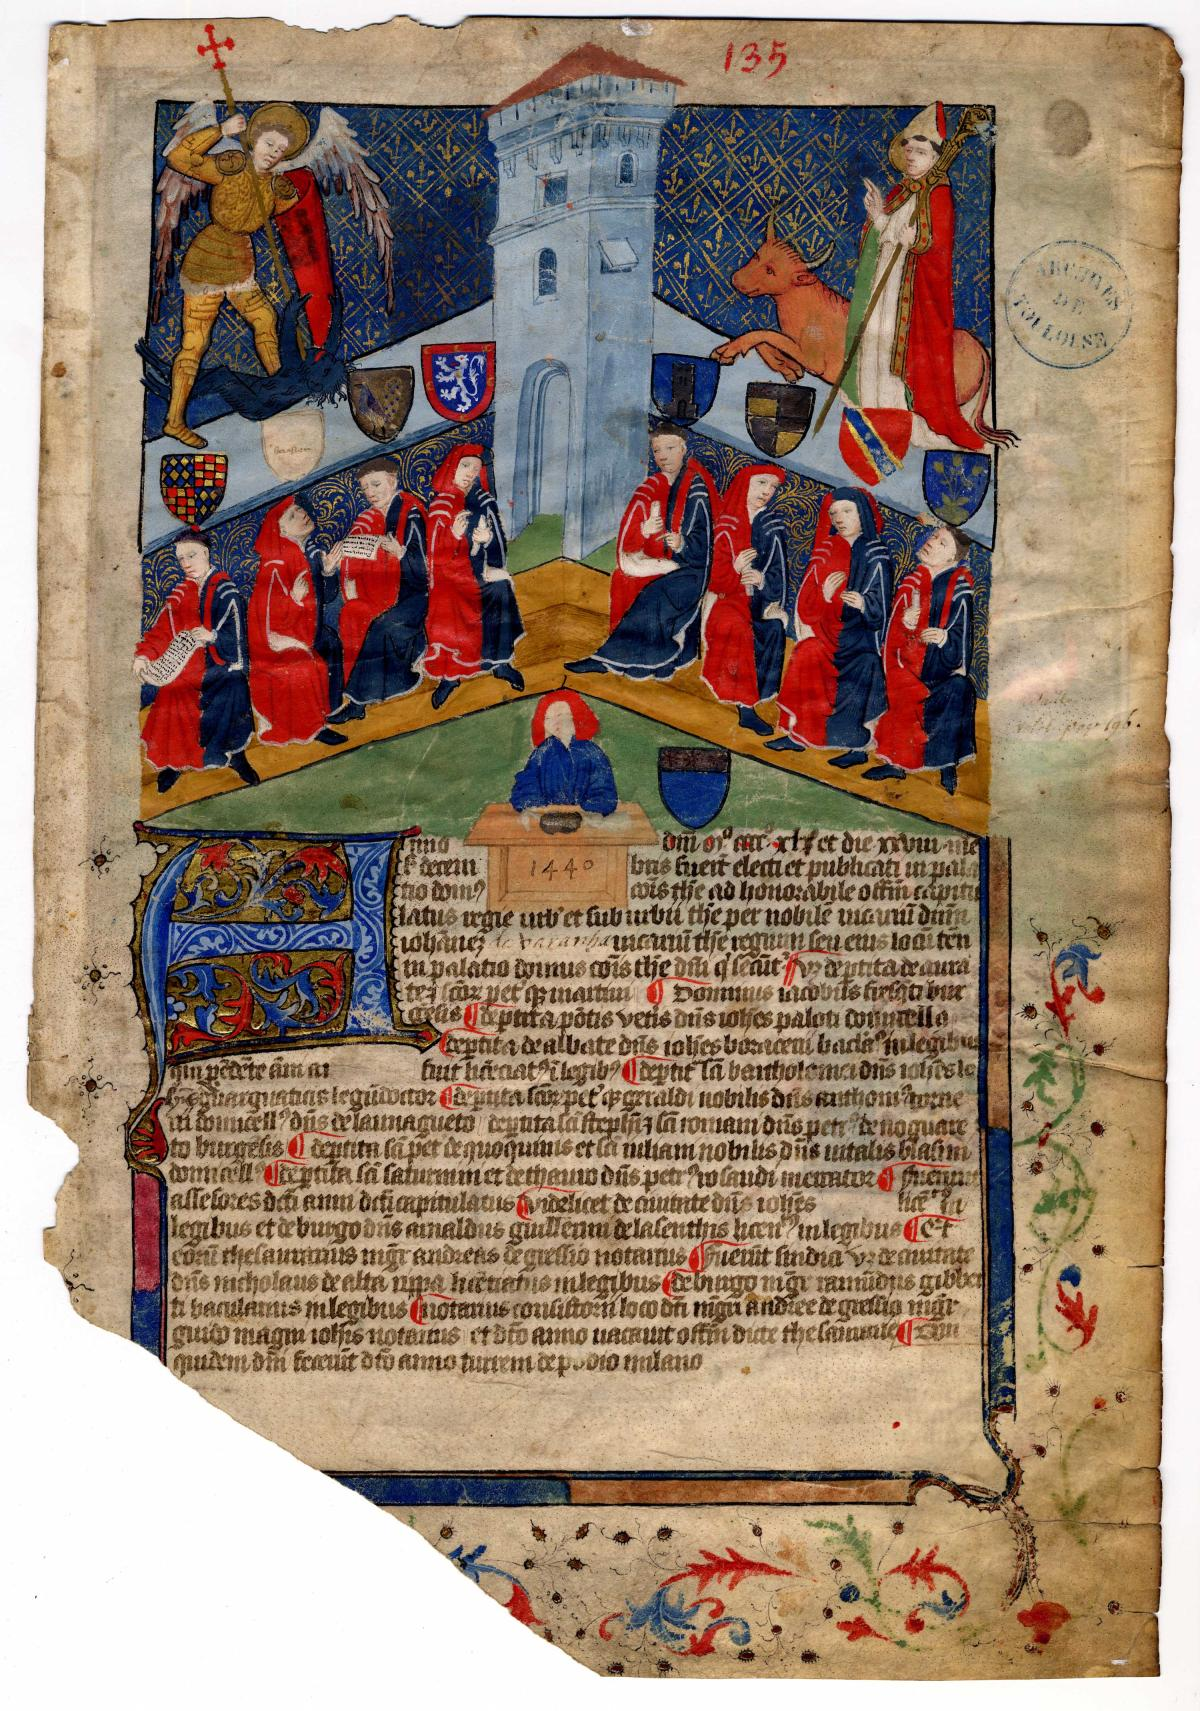 Les armoiries - Toulouse archives